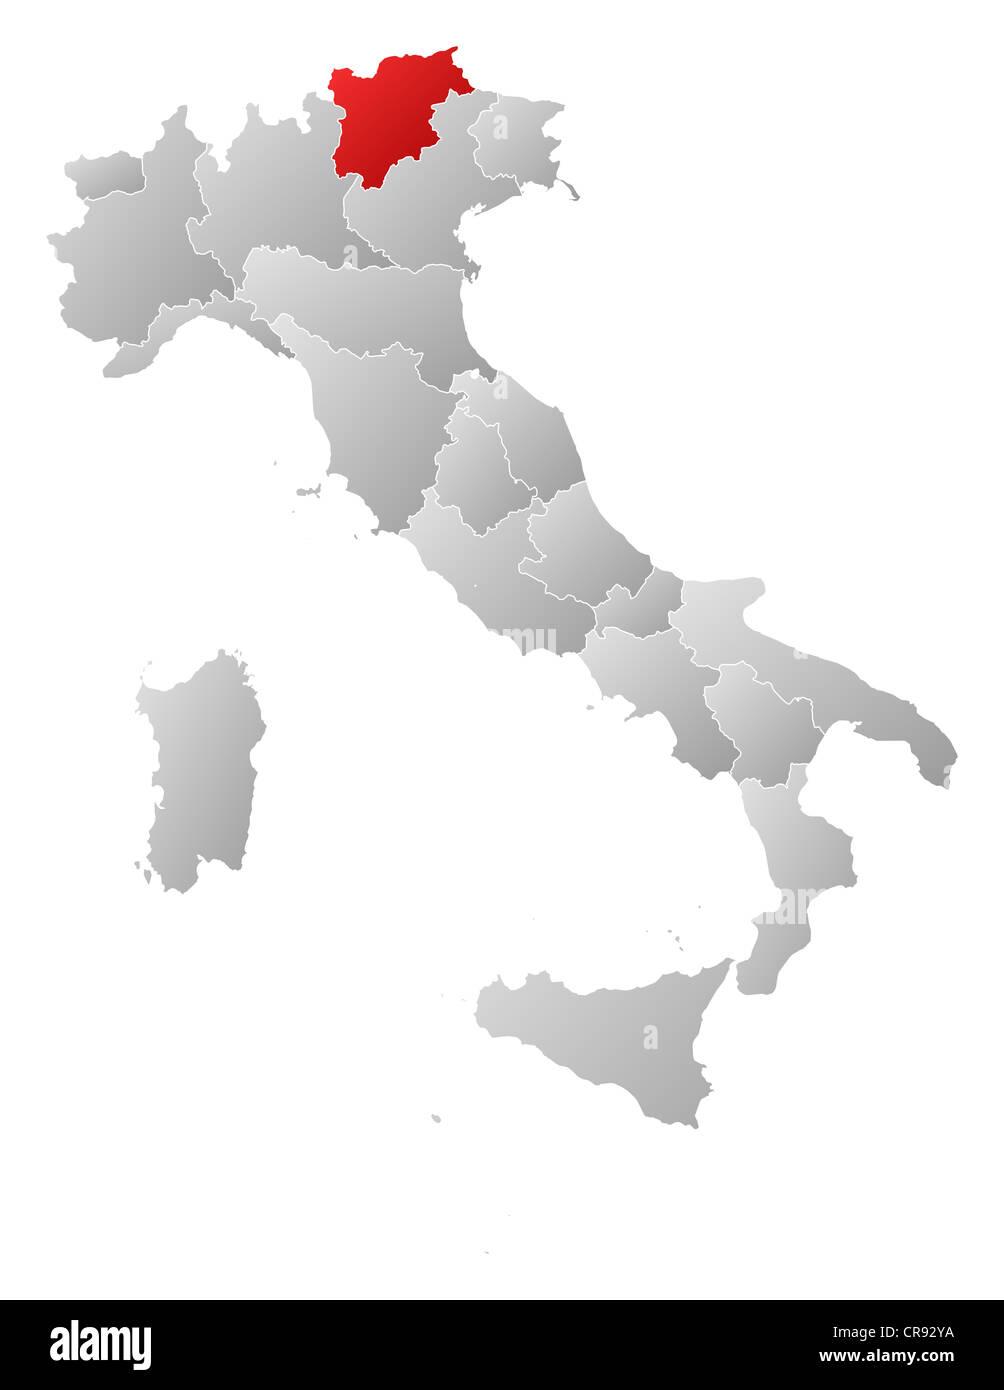 Cartina Italia Trentino Alto Adige.Political Map Of Italy With The Several Regions Where Trentino Alto Stock Photo Alamy